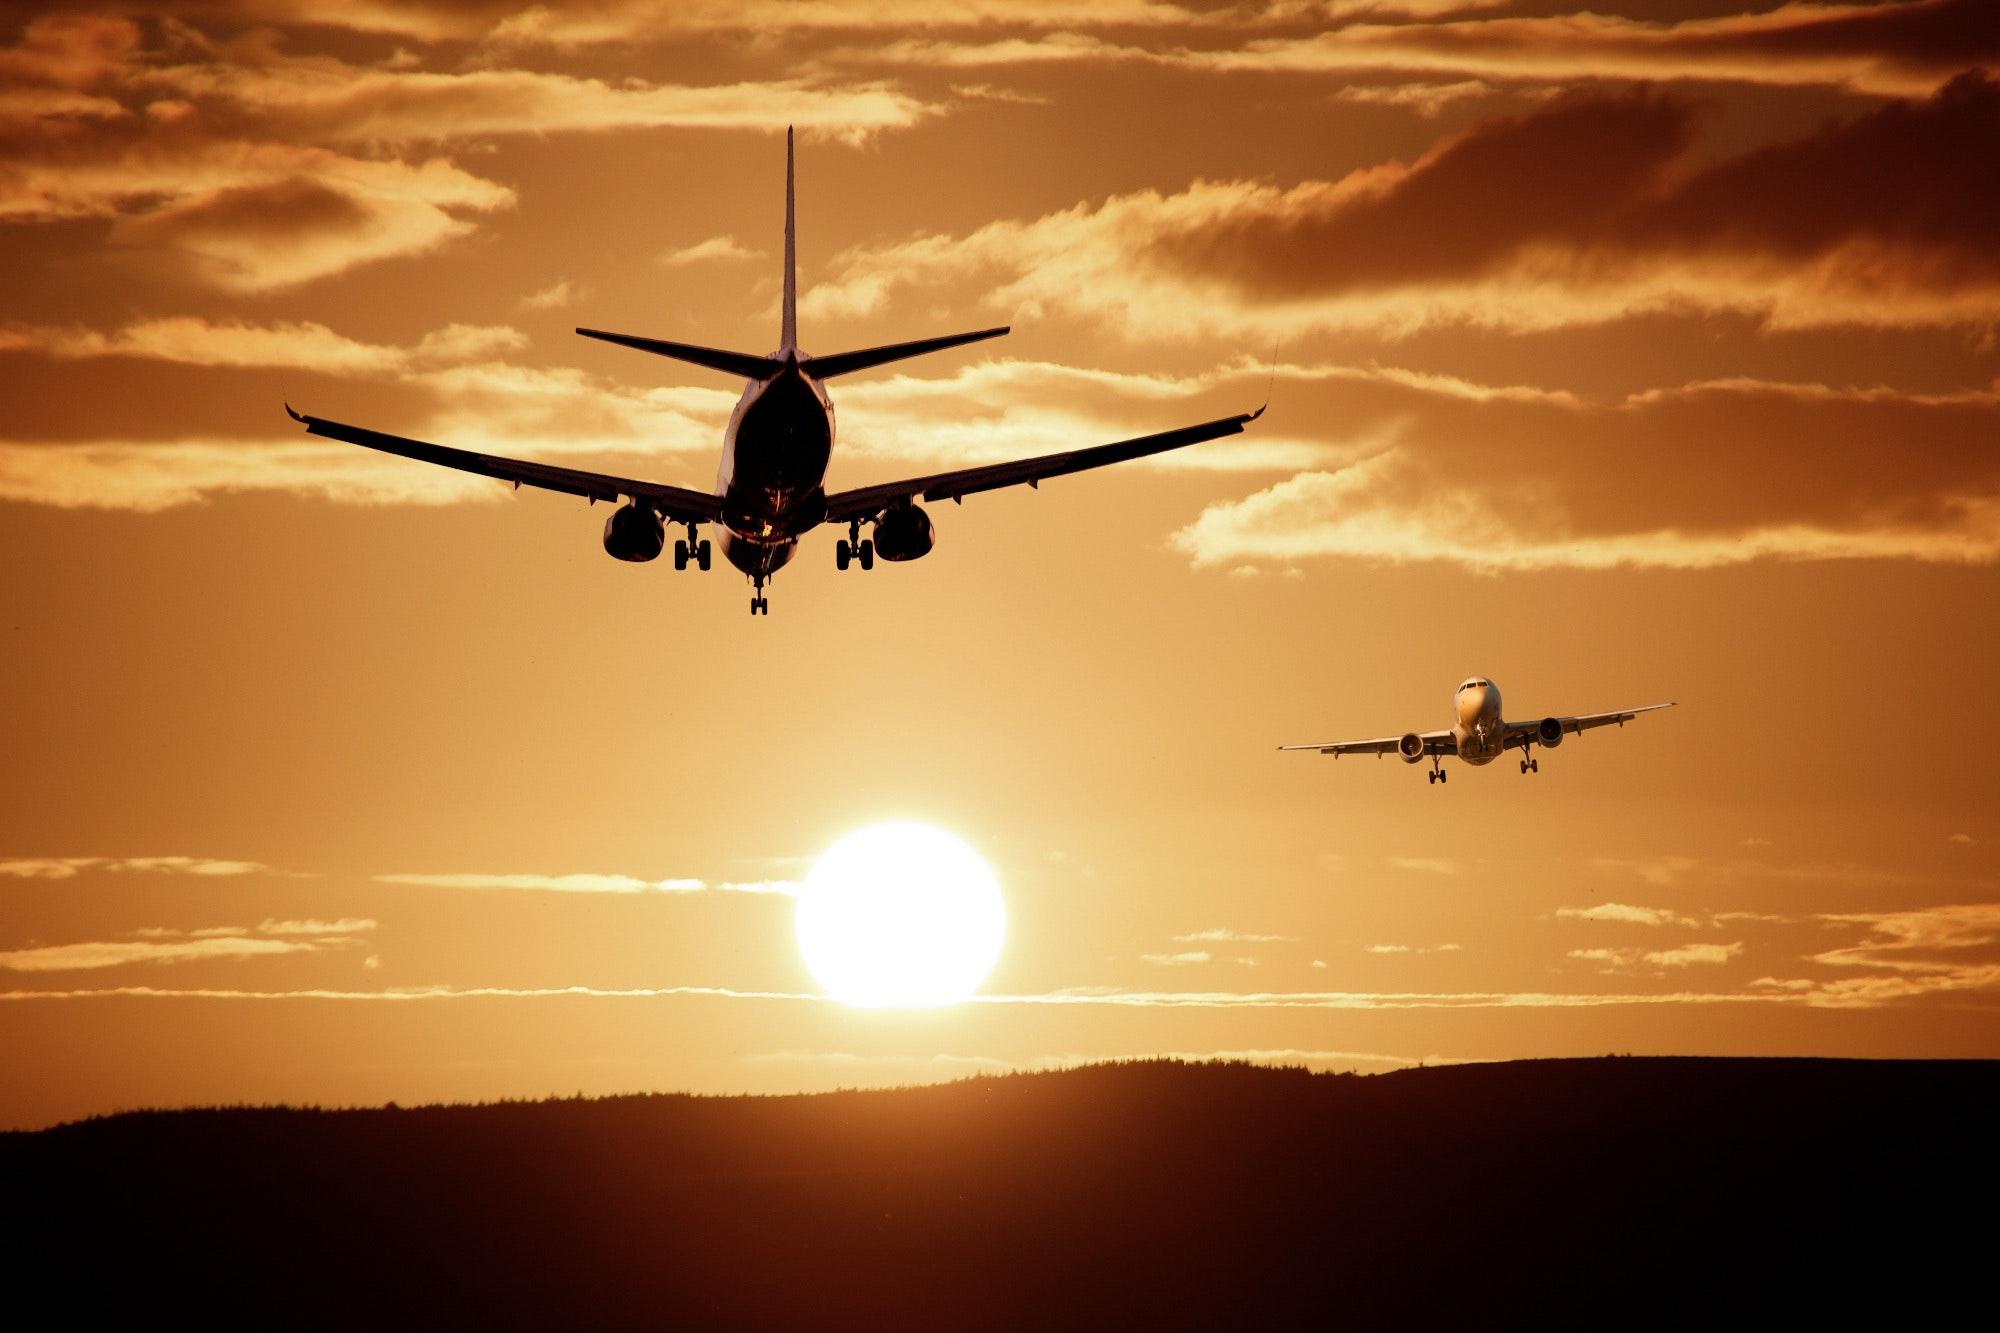 aeroplanes-aircrafts-airplanes-47044